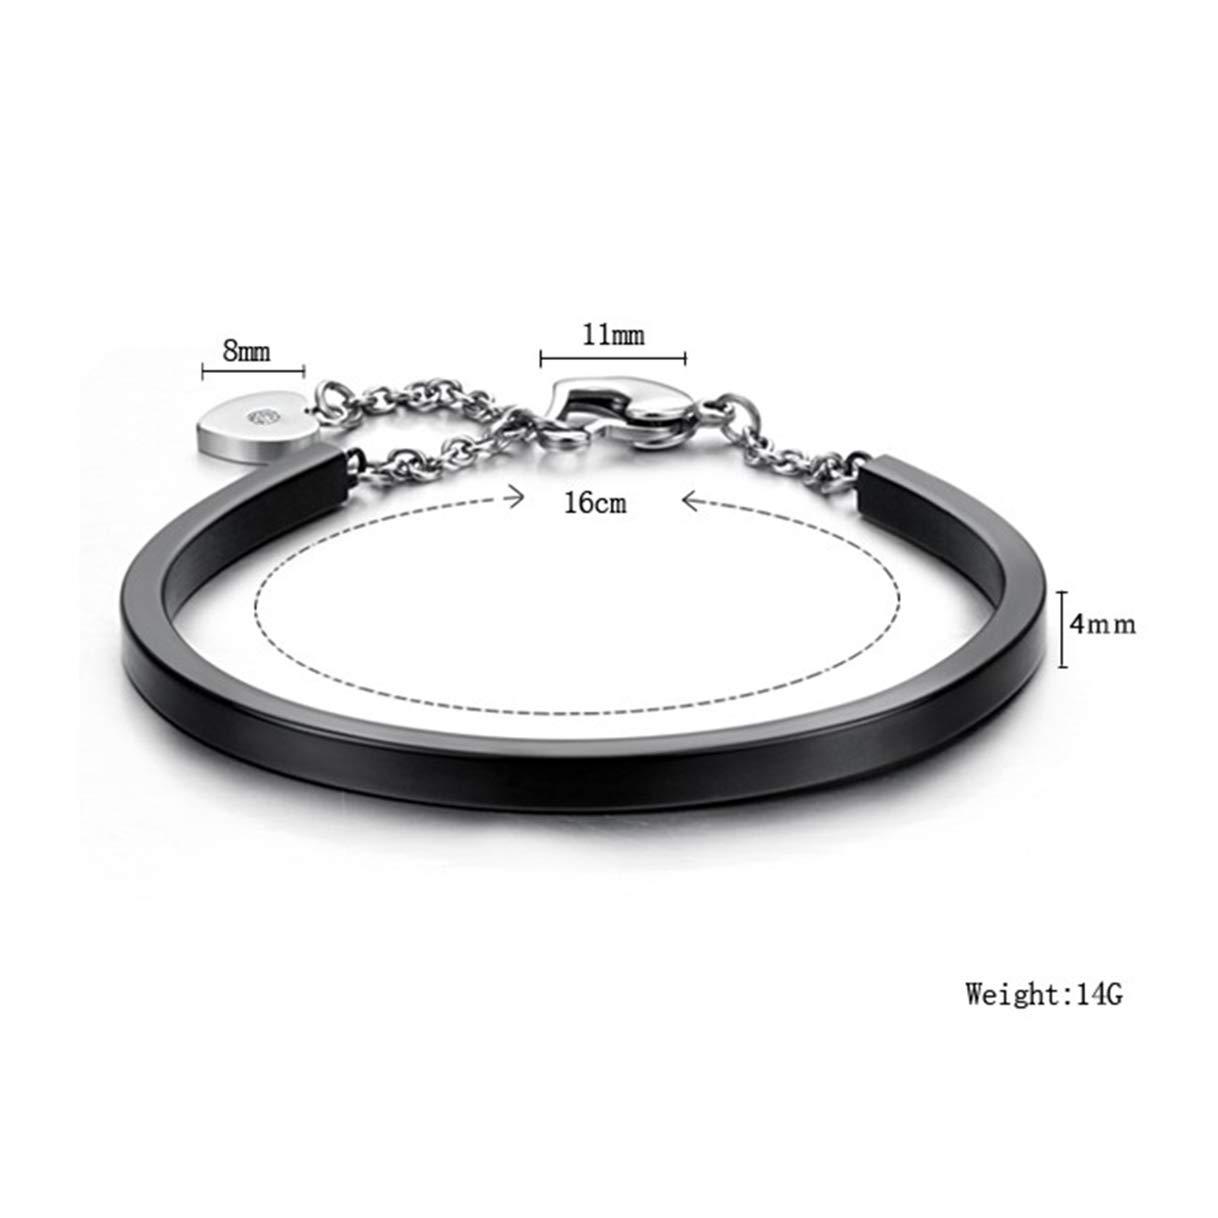 CHARMFAME Stainless Steel Black Bangle Heart Lock Cuff Bracelet Fashion Jewelry for Women /& Girls